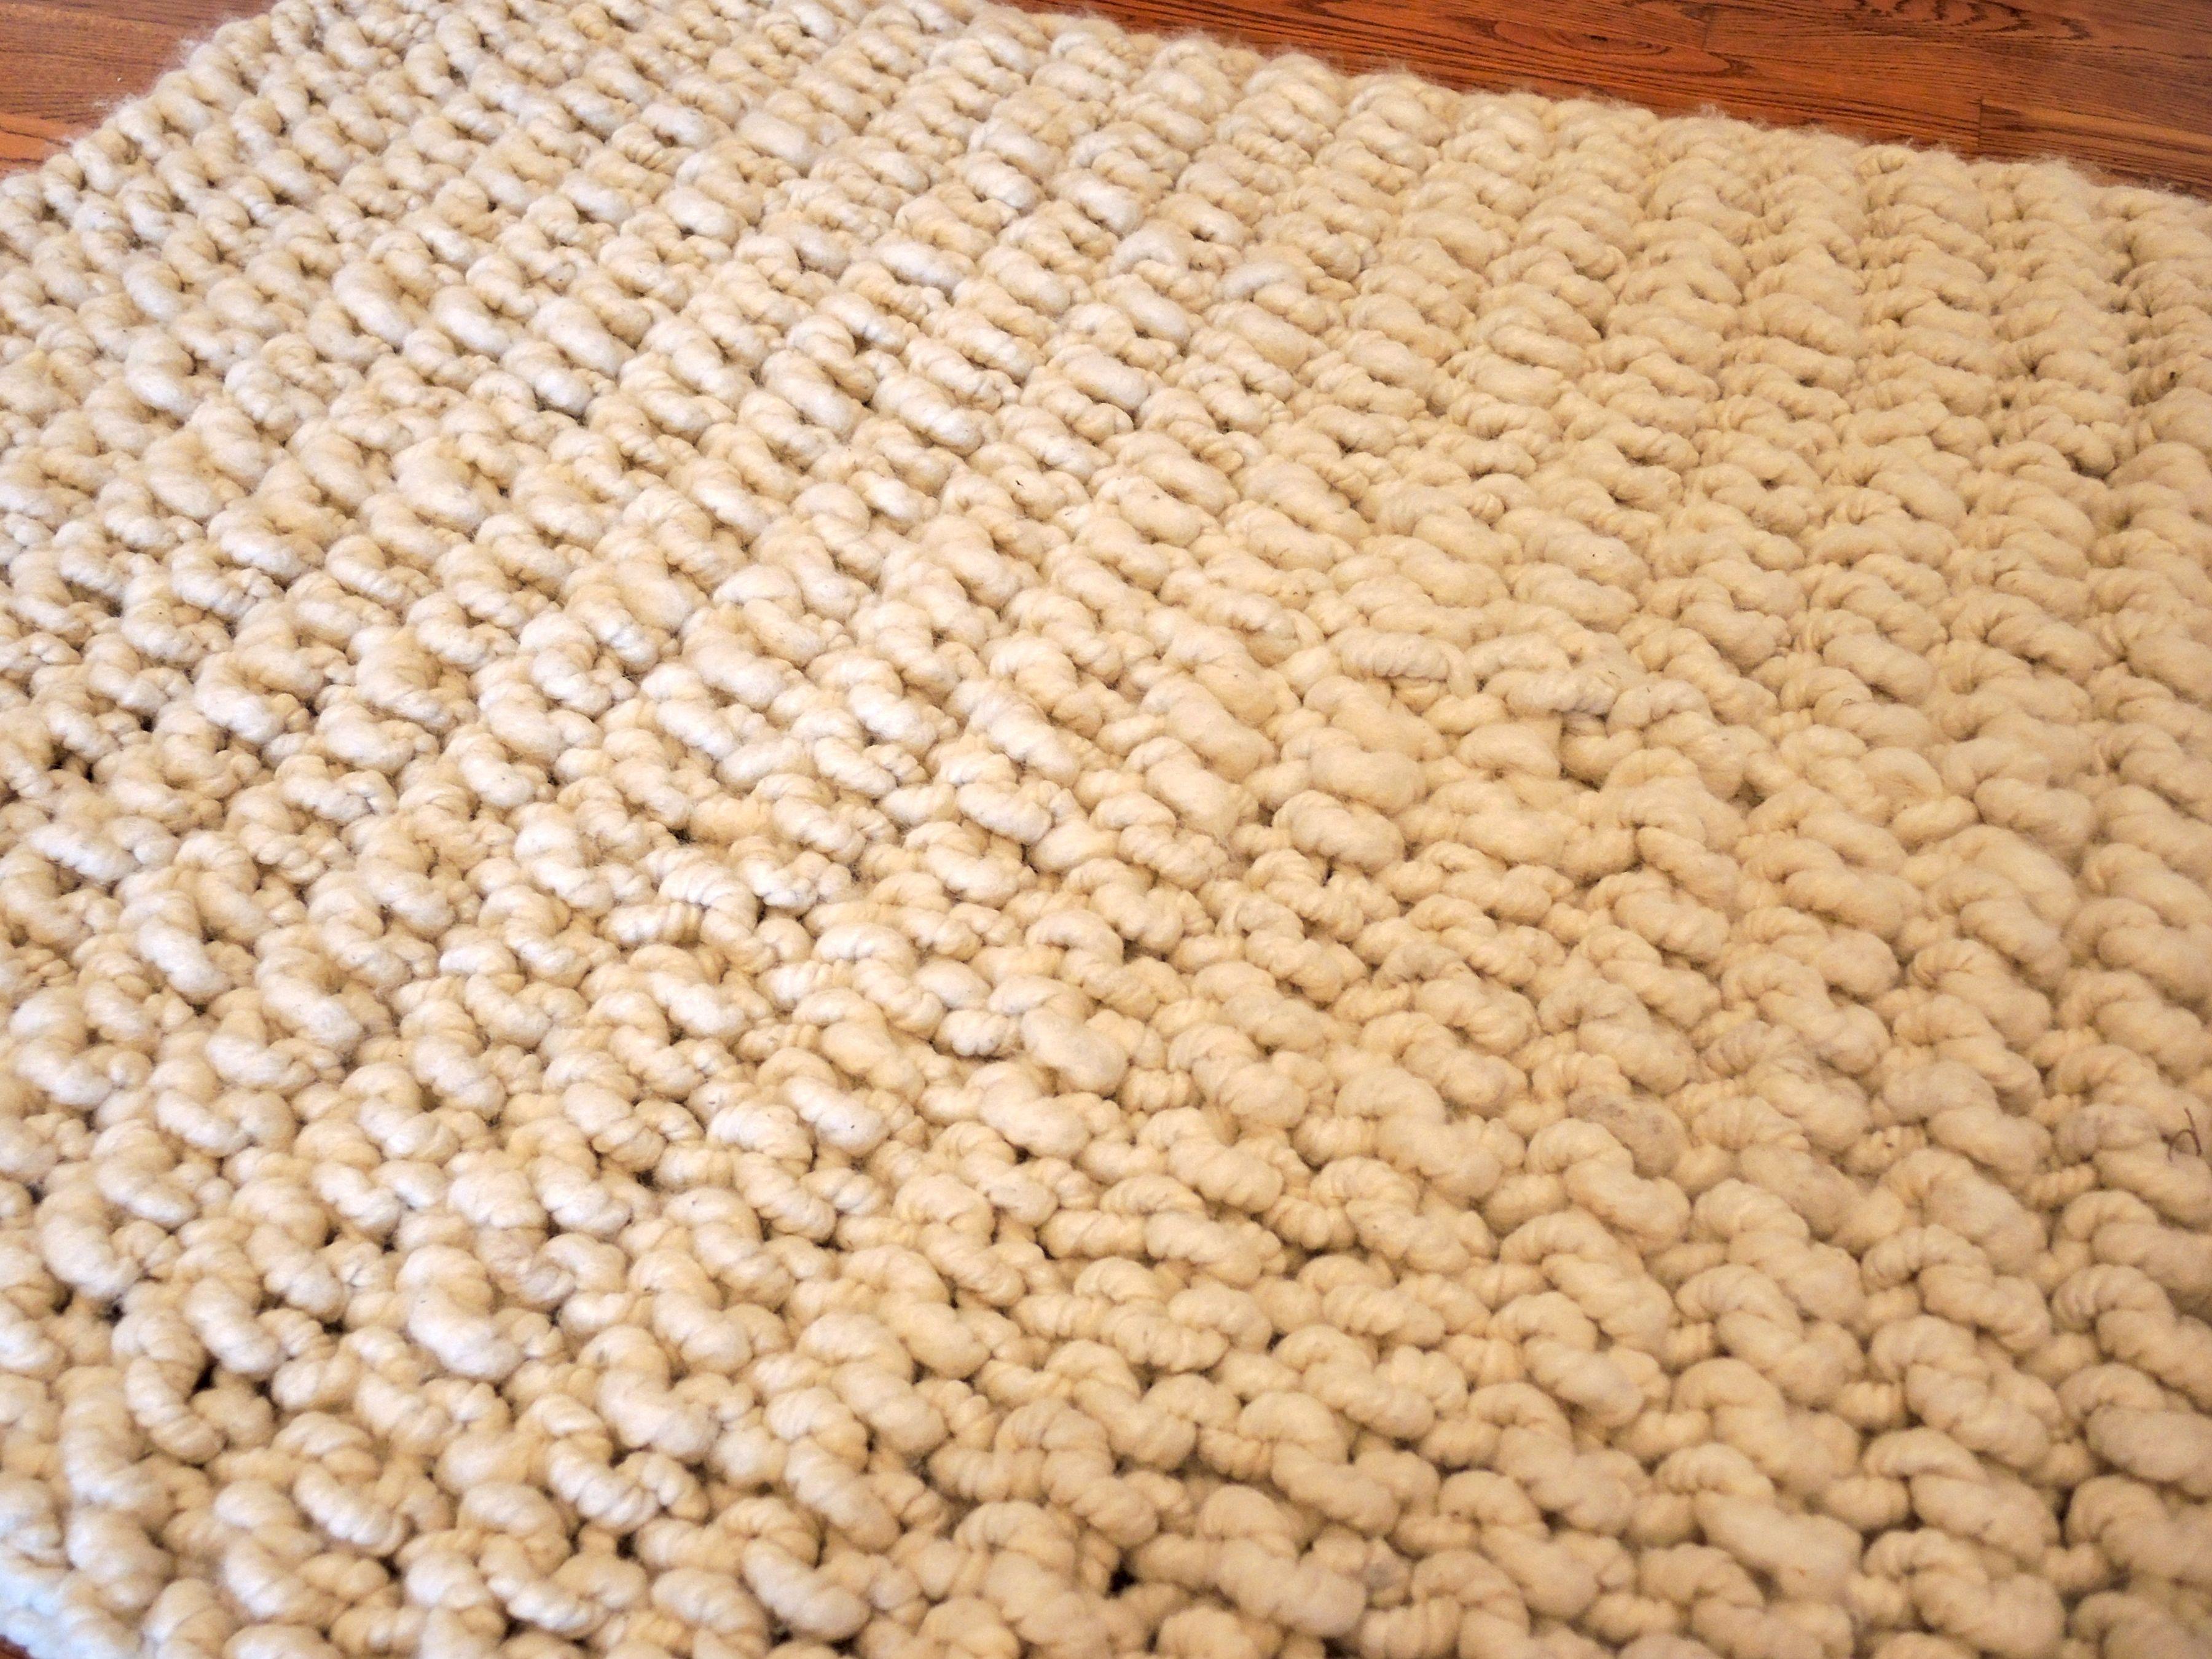 Knitting Projects With Yarn P Alpaca Rug